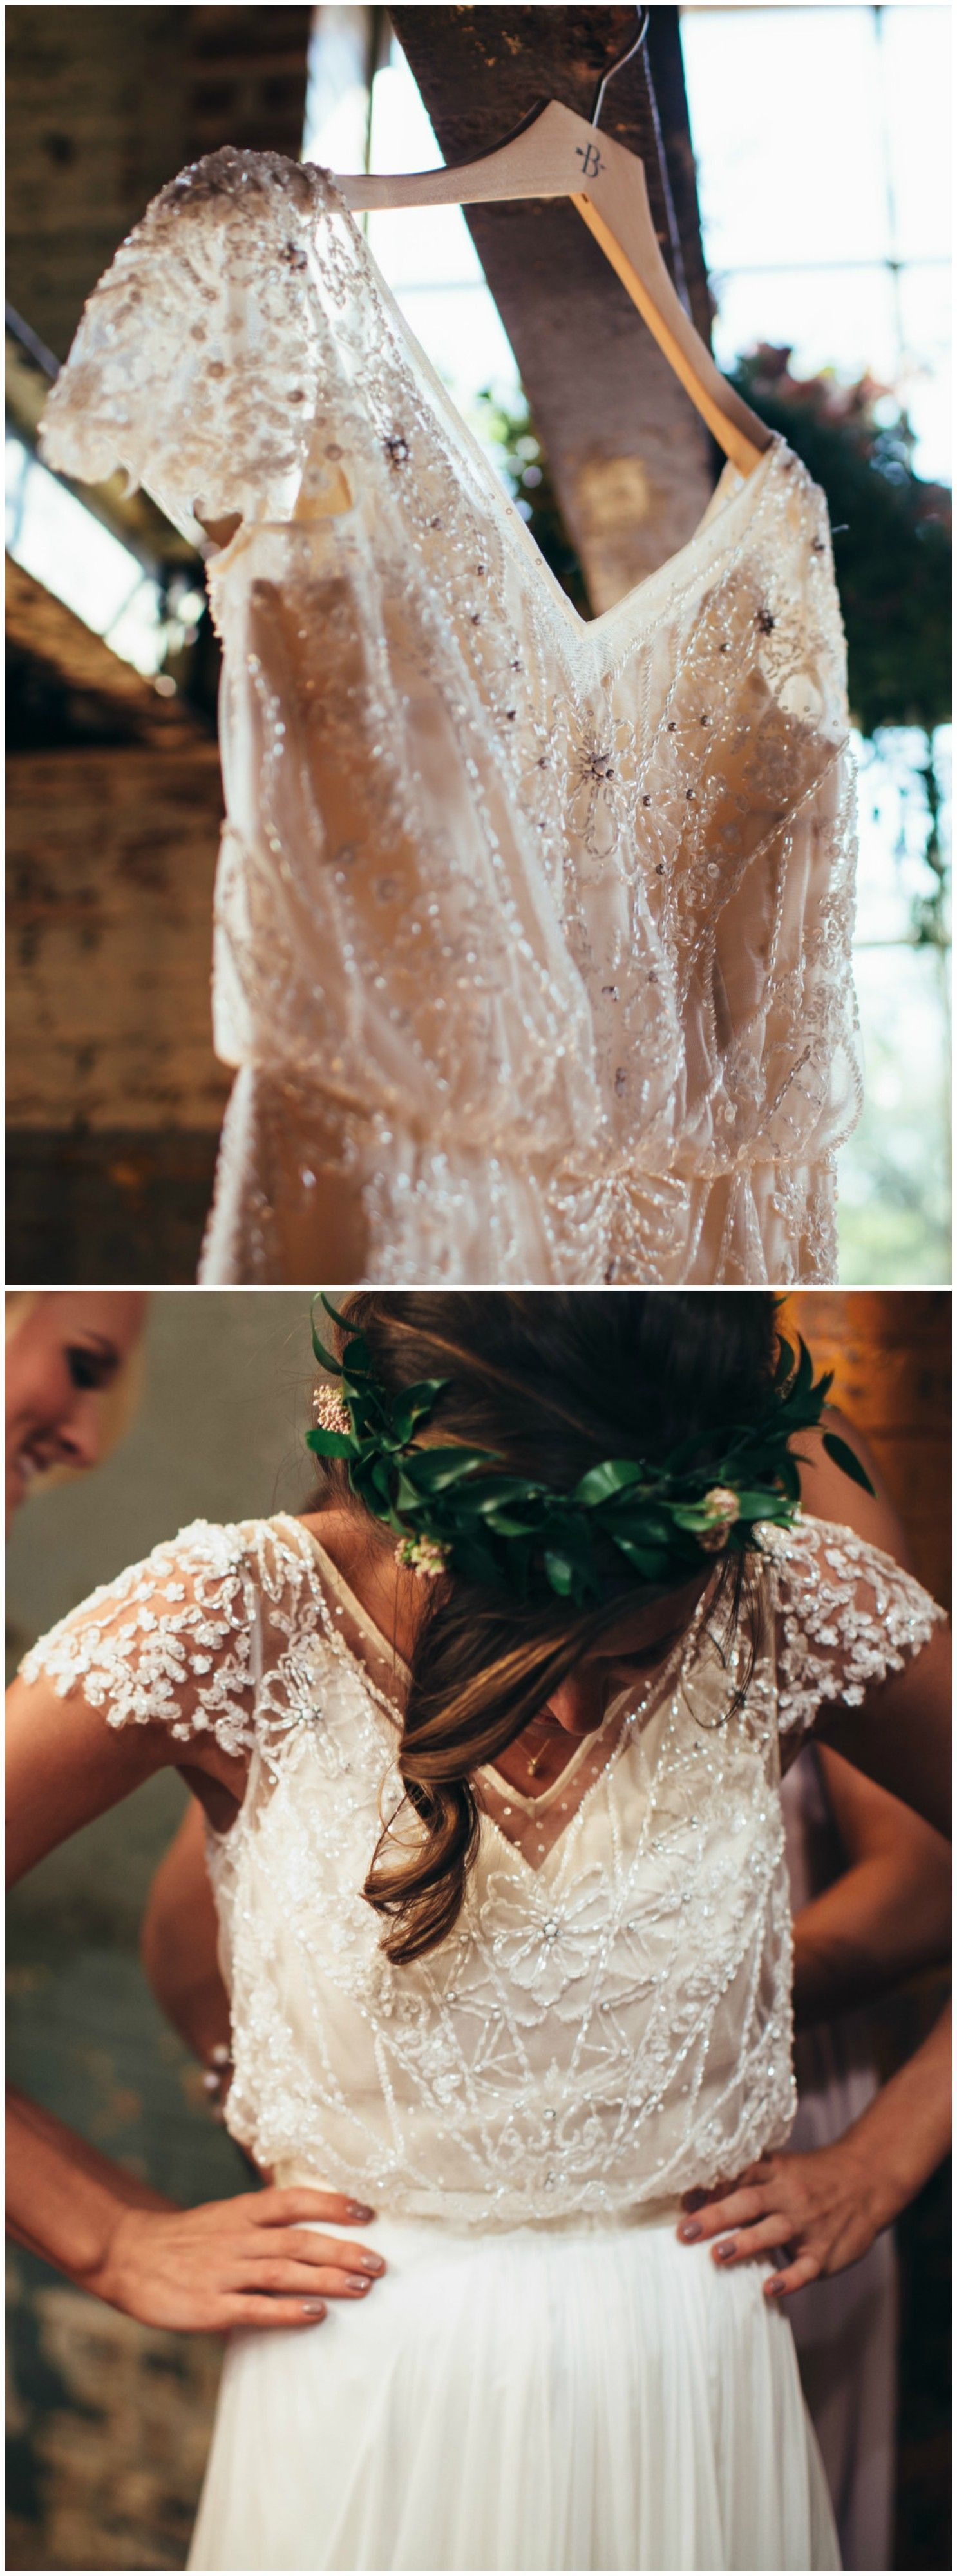 Vintage bohemian wedding dress  Beaded wedding dress fluttering cap sleeves chic bridal gown